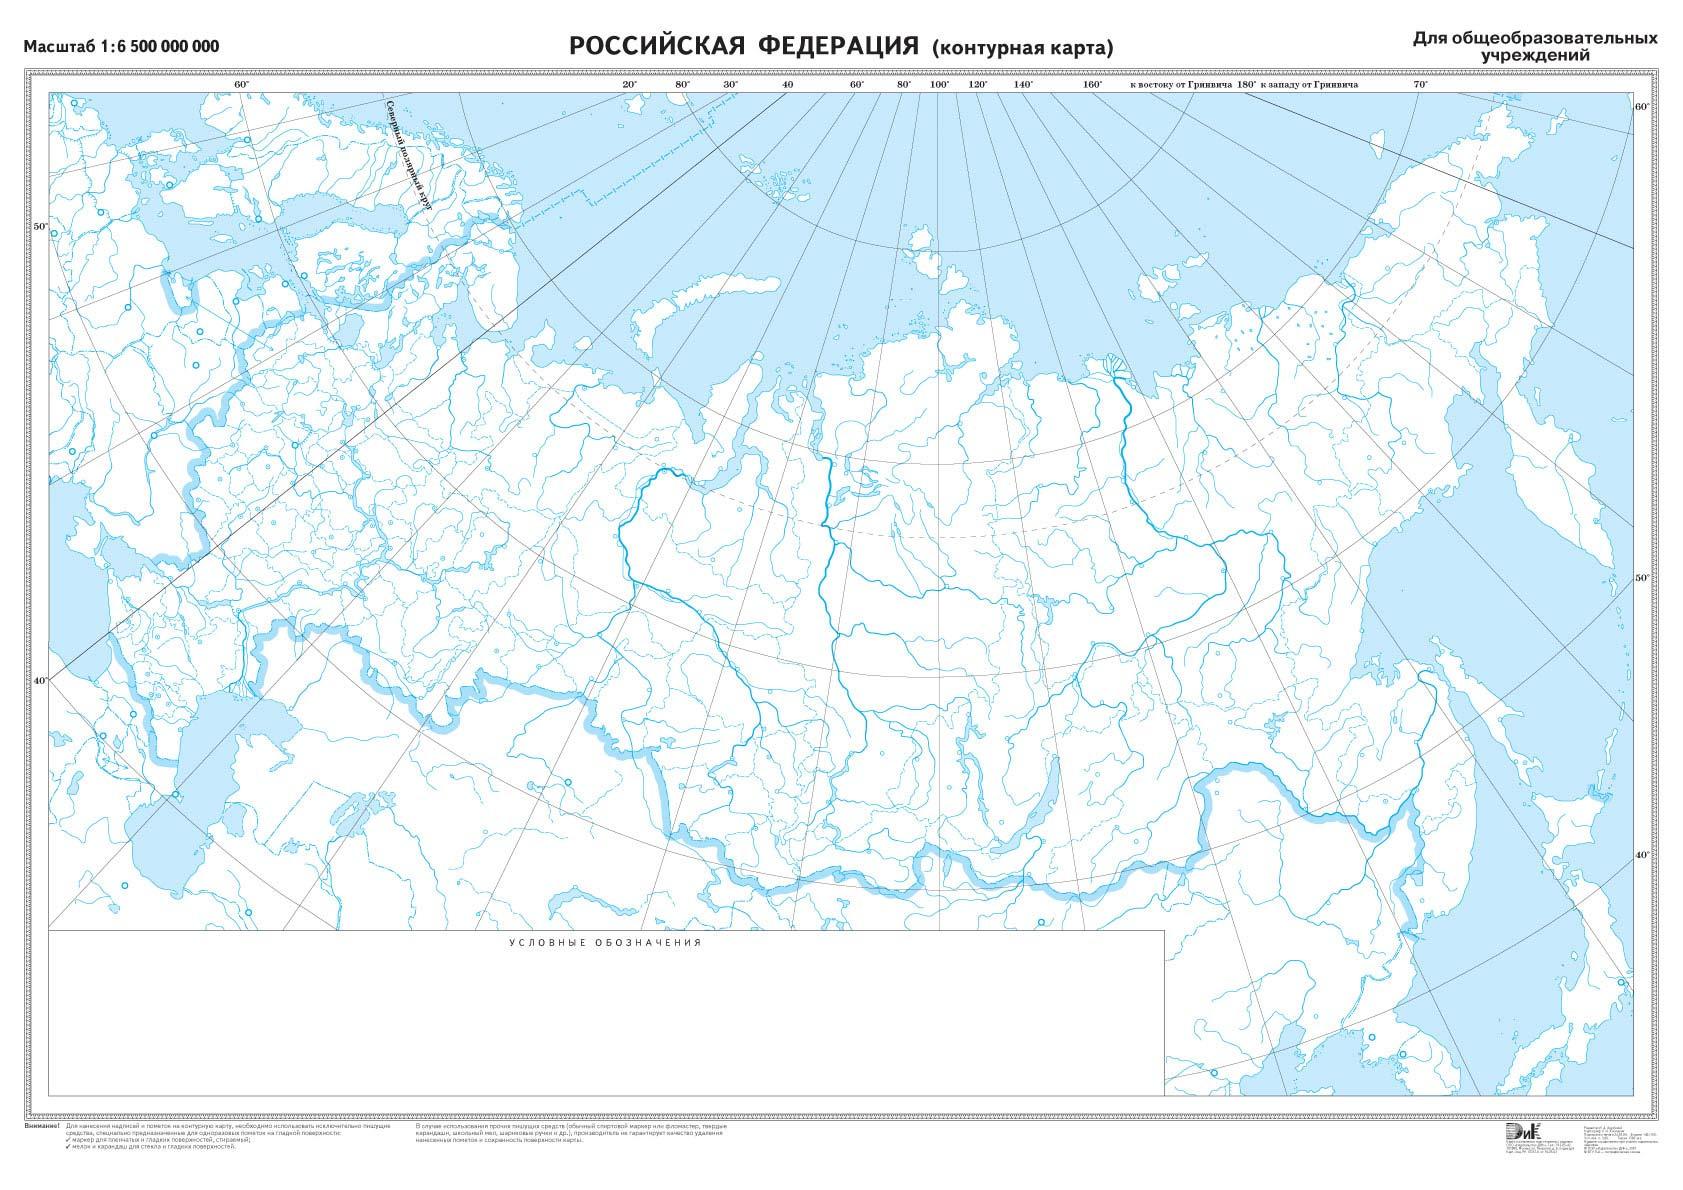 Контурная карта беларуси 10 класс гидрография